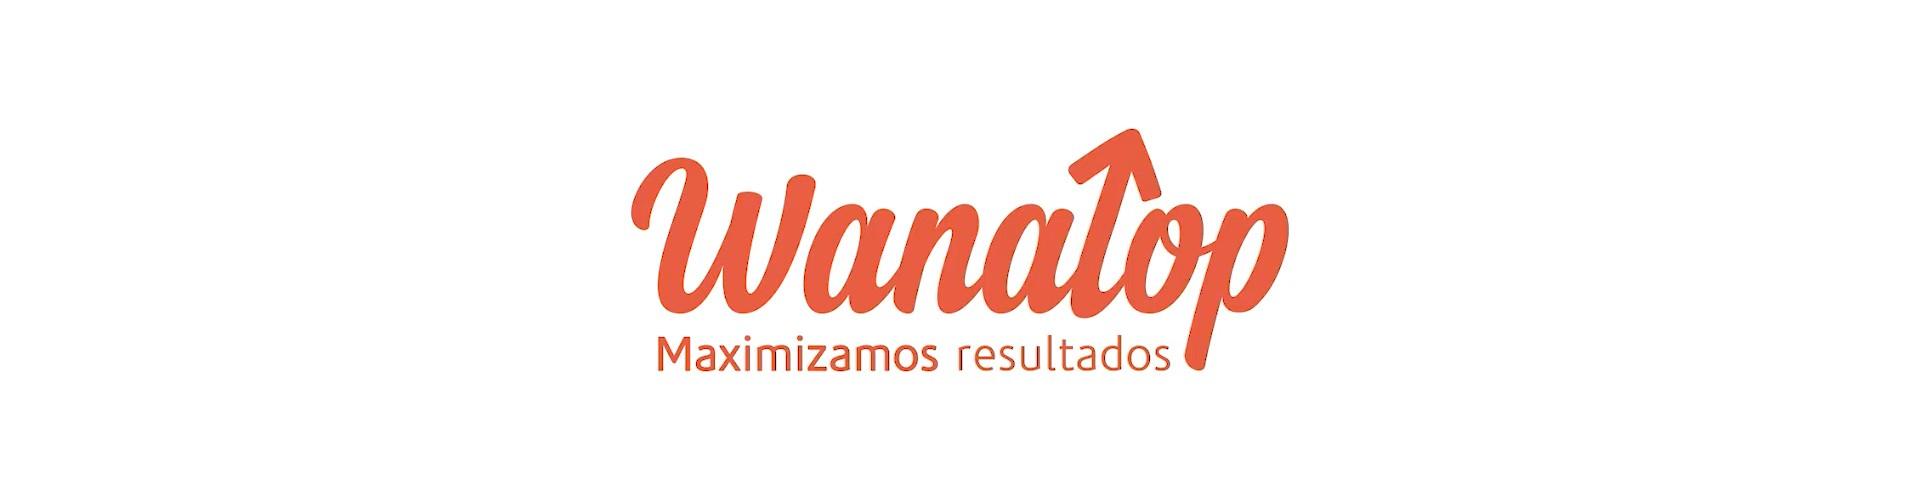 Imagen placeholder del post Wanatop